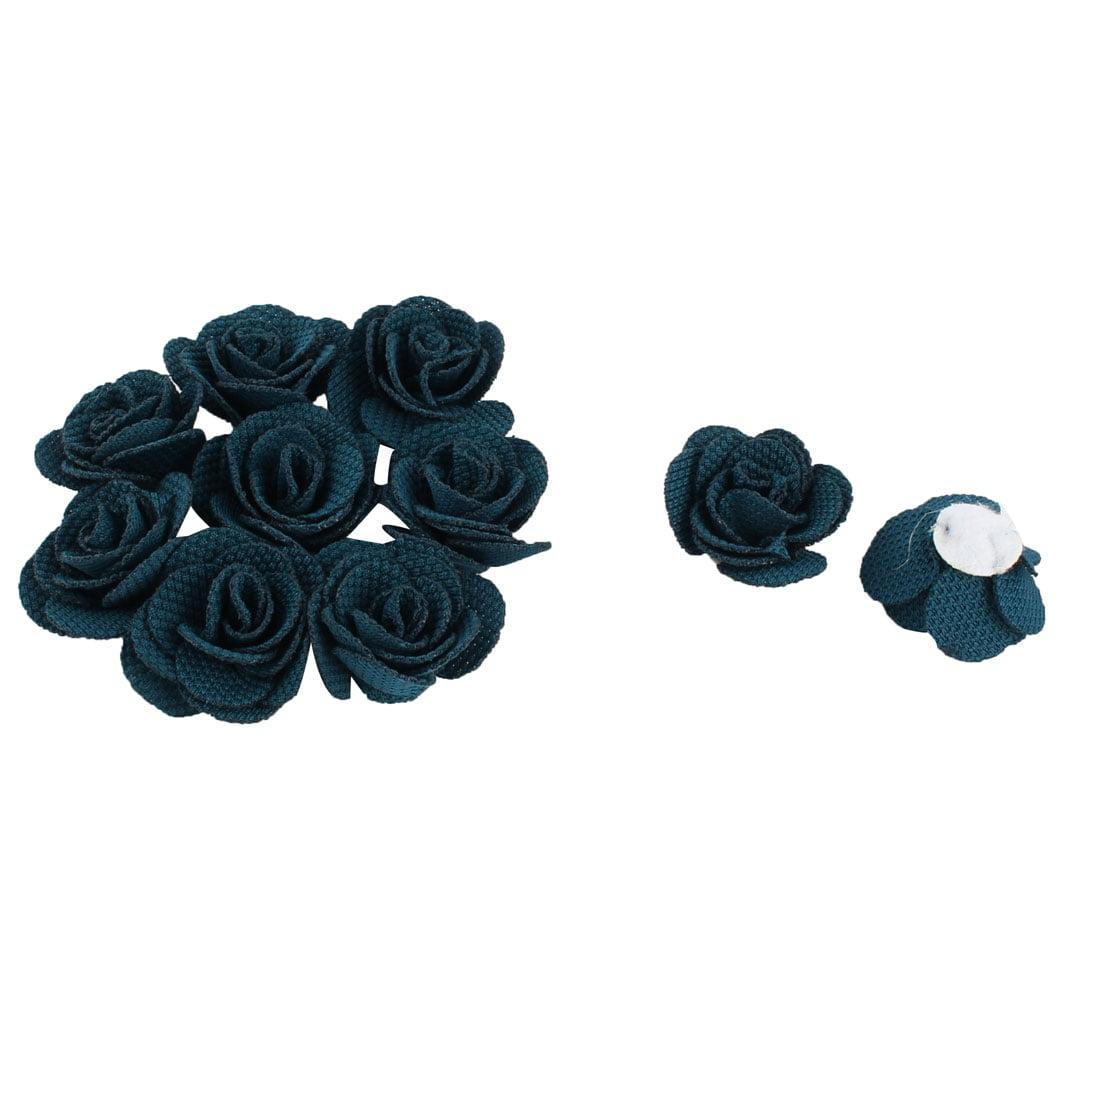 Fabric Camellia Craft Decor DIY Wedding Ornament Ribbon Flowers Dark Blue 10pcs